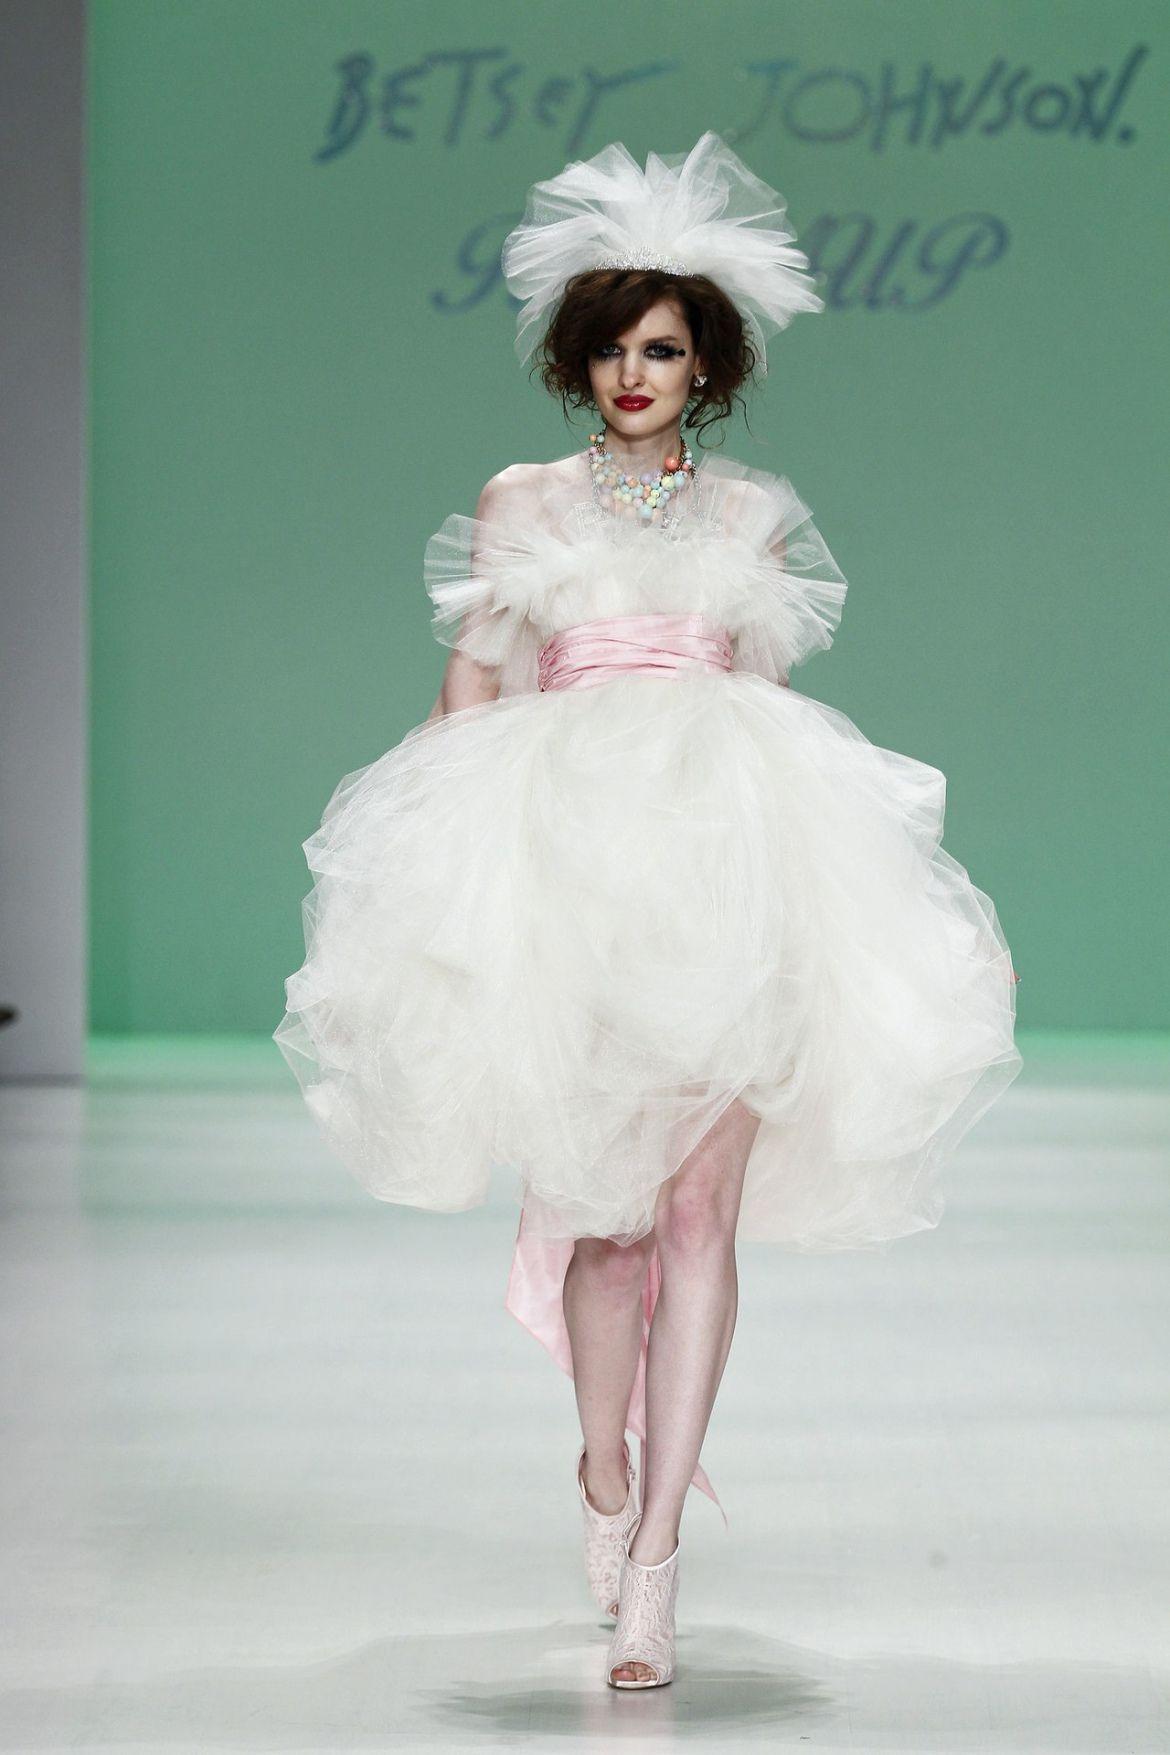 Betsey johnson wedding dresses   Betsey Johnson Wedding Dresses  Dresses for Guest at Wedding